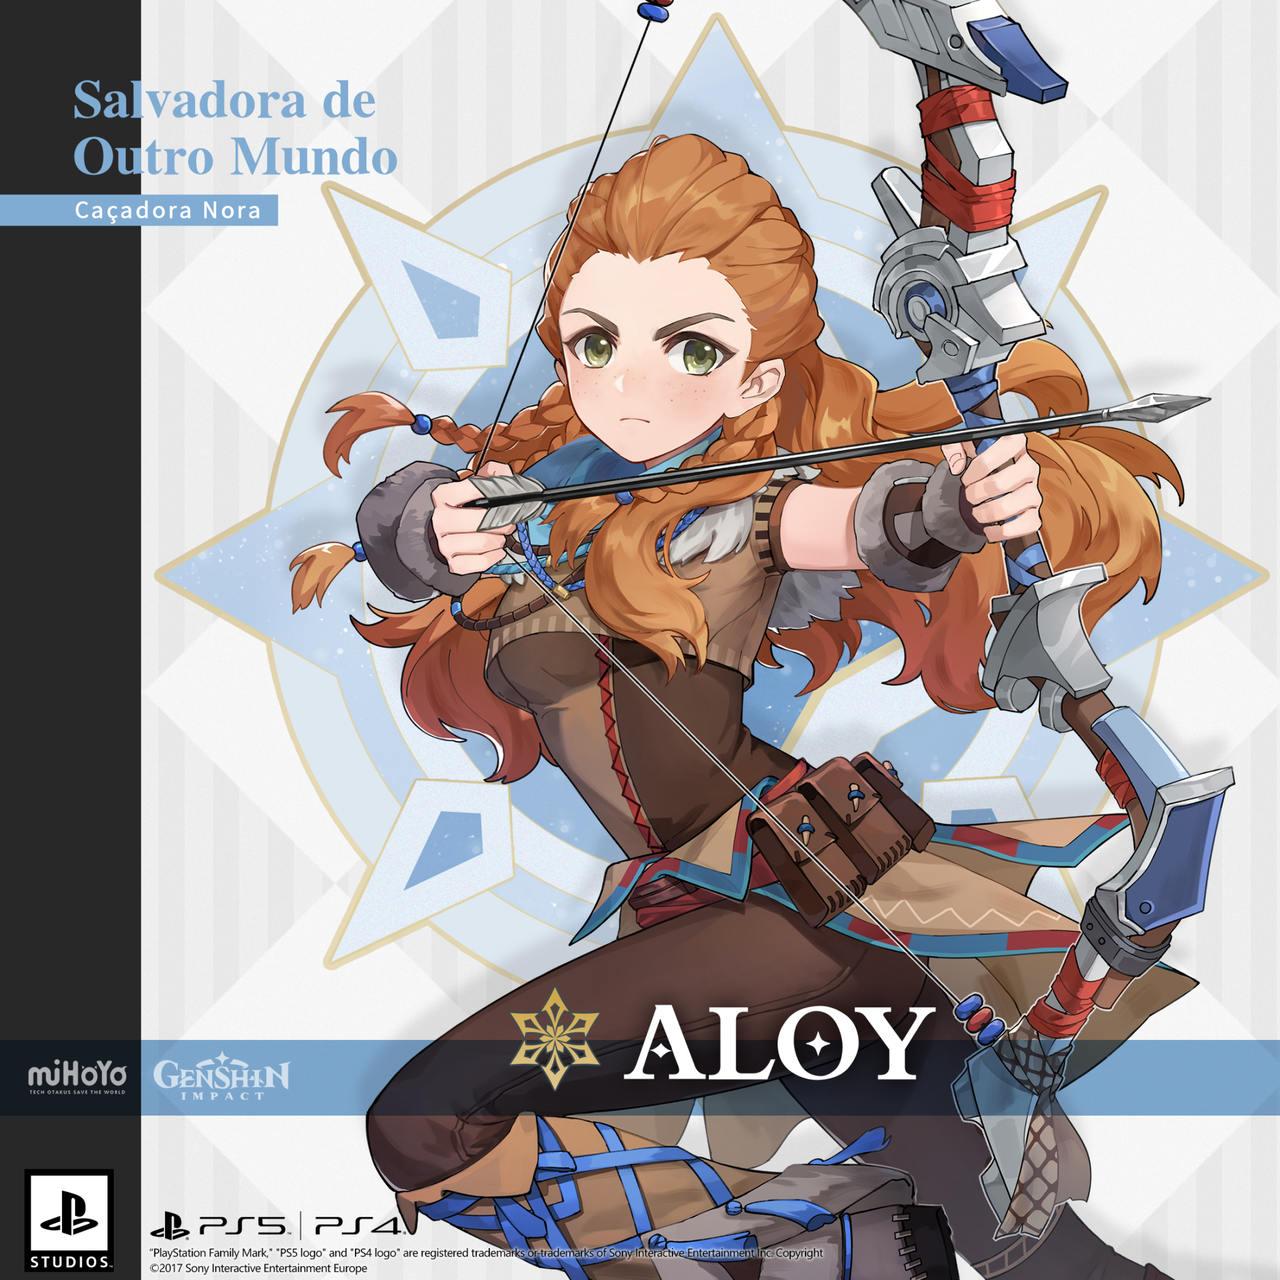 Aloy em Genshin Impact